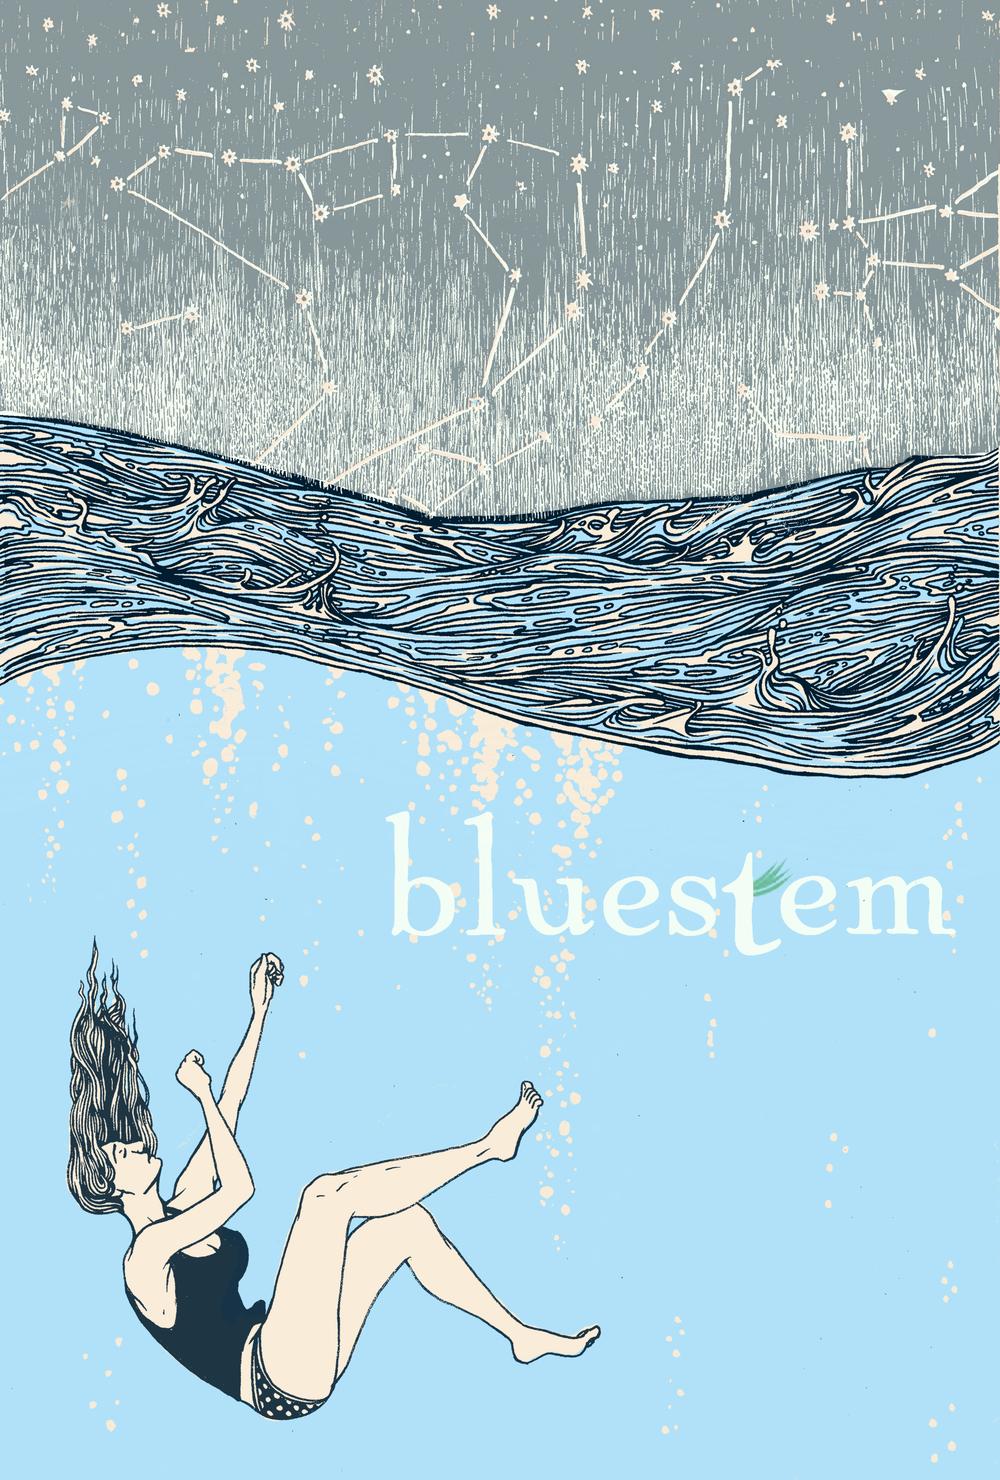 Cover design for Bluestem Magazine 2013 Print Issue